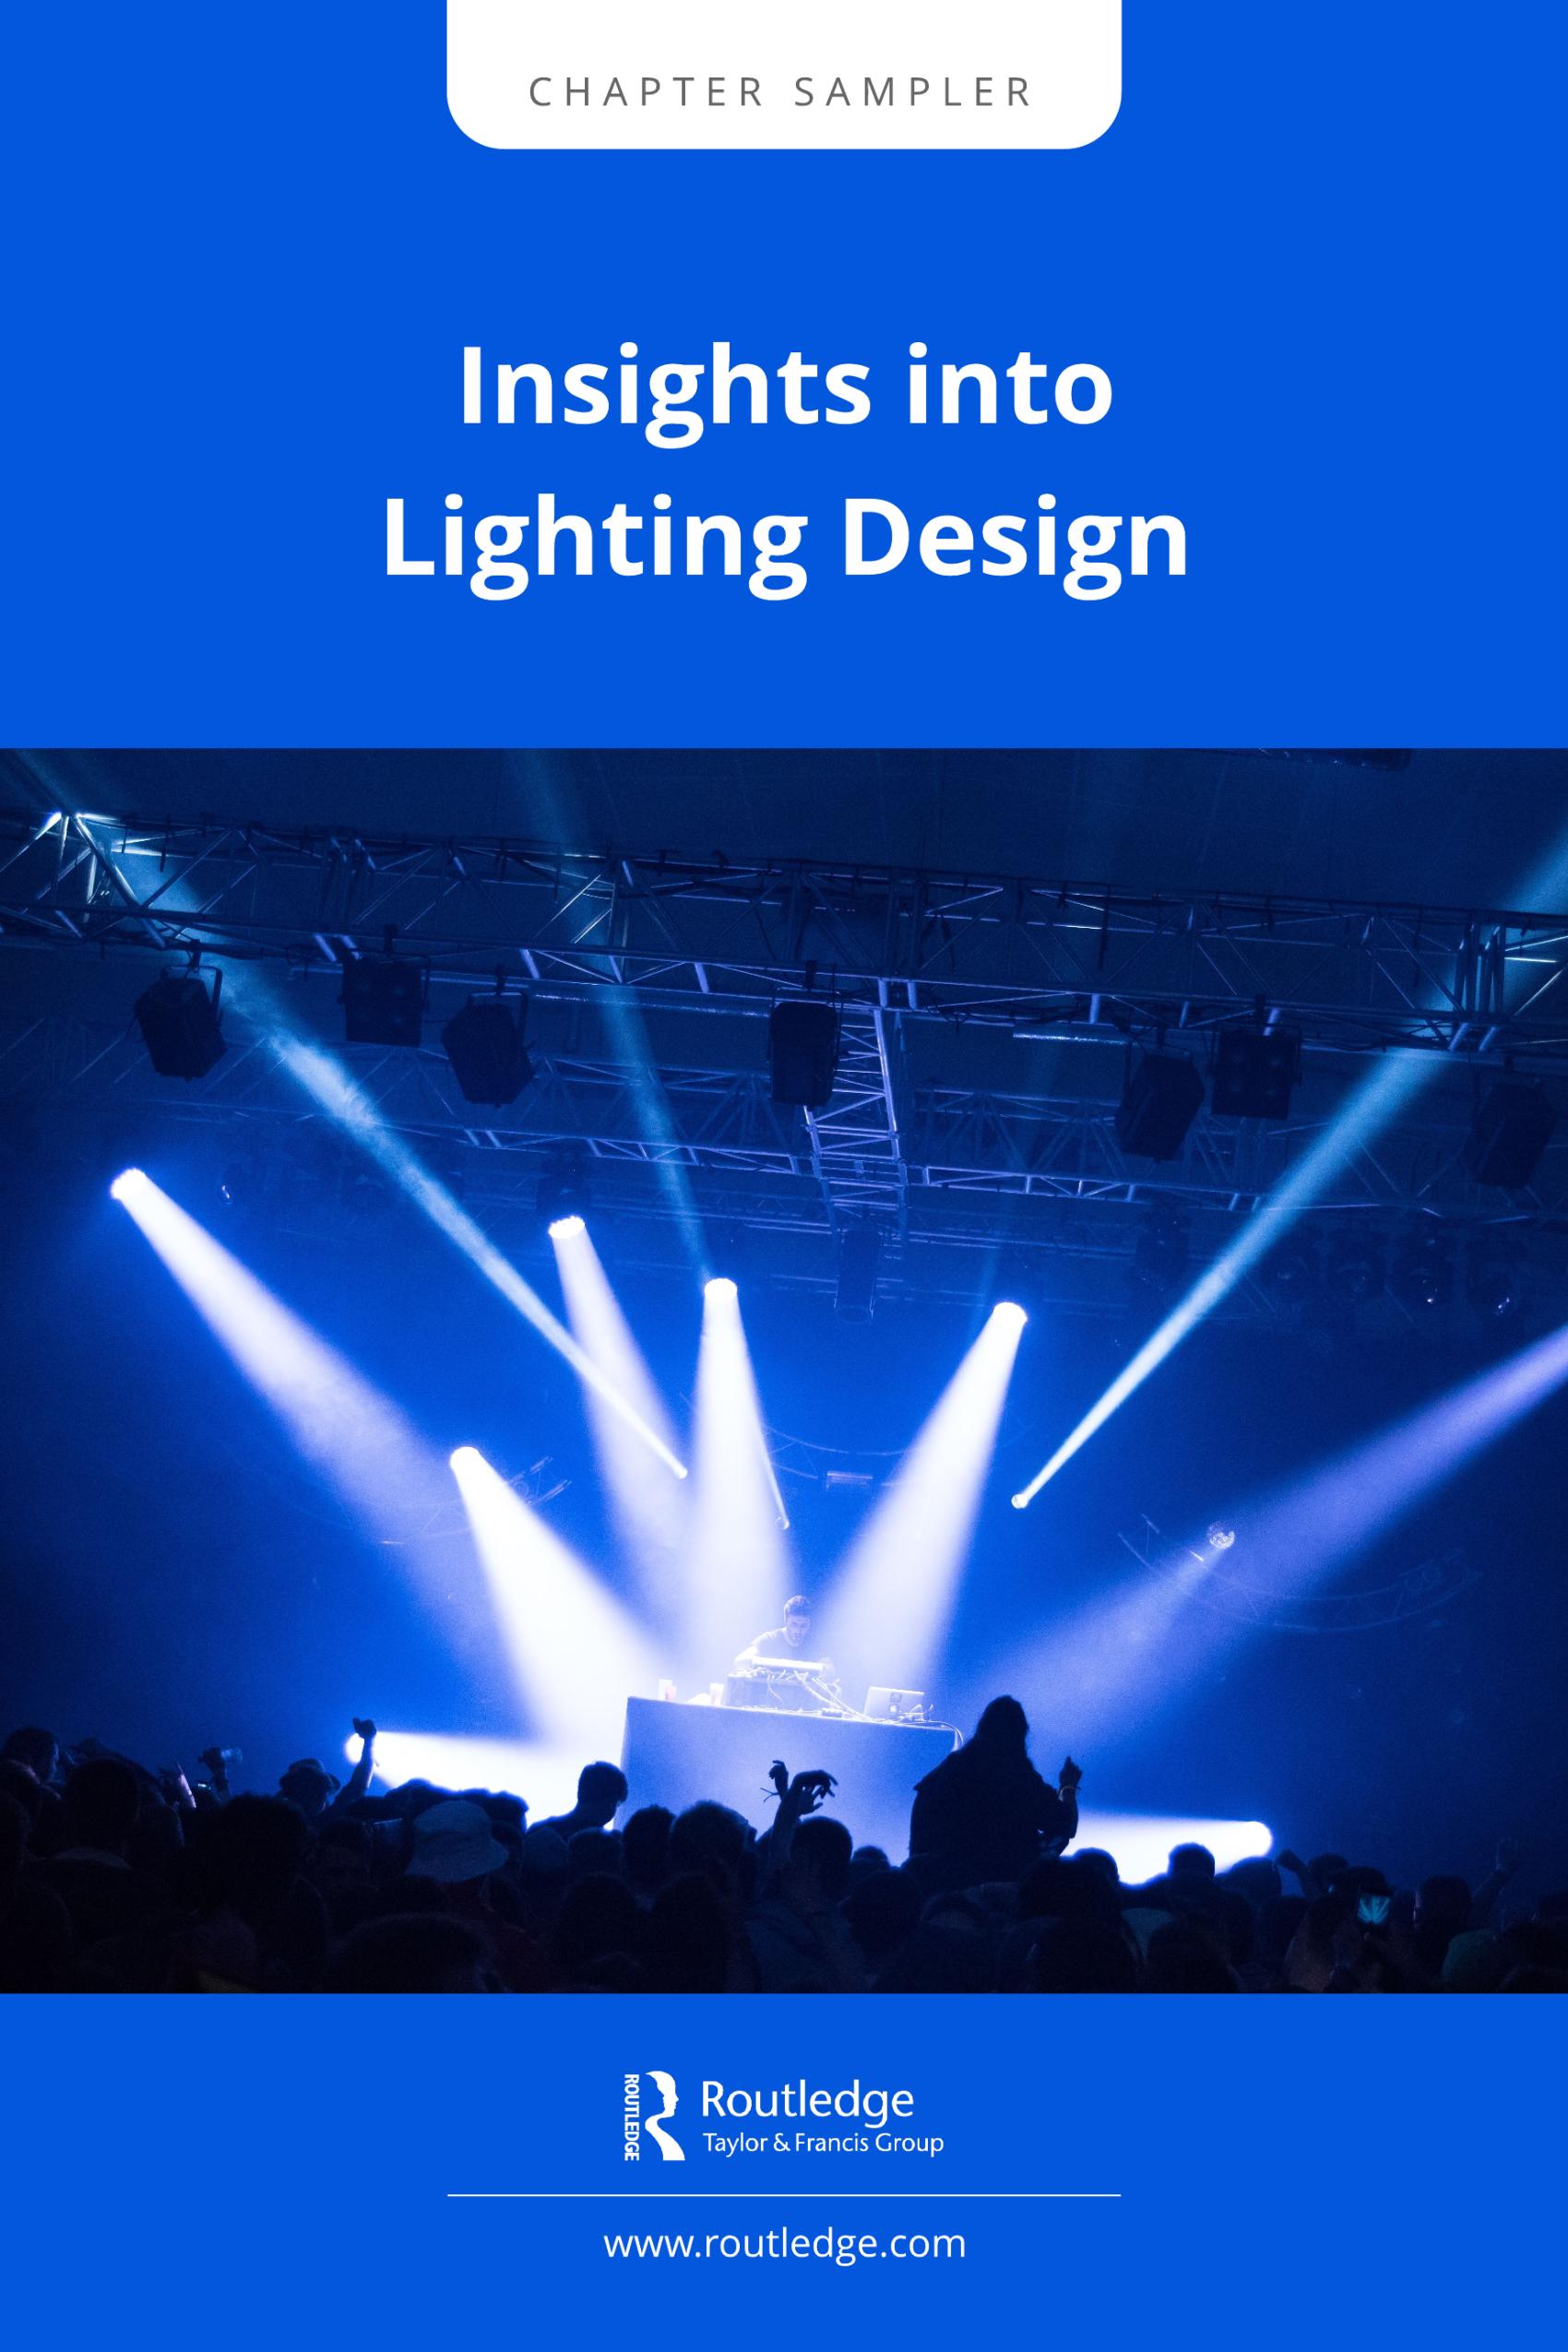 Insights into Lighting Design